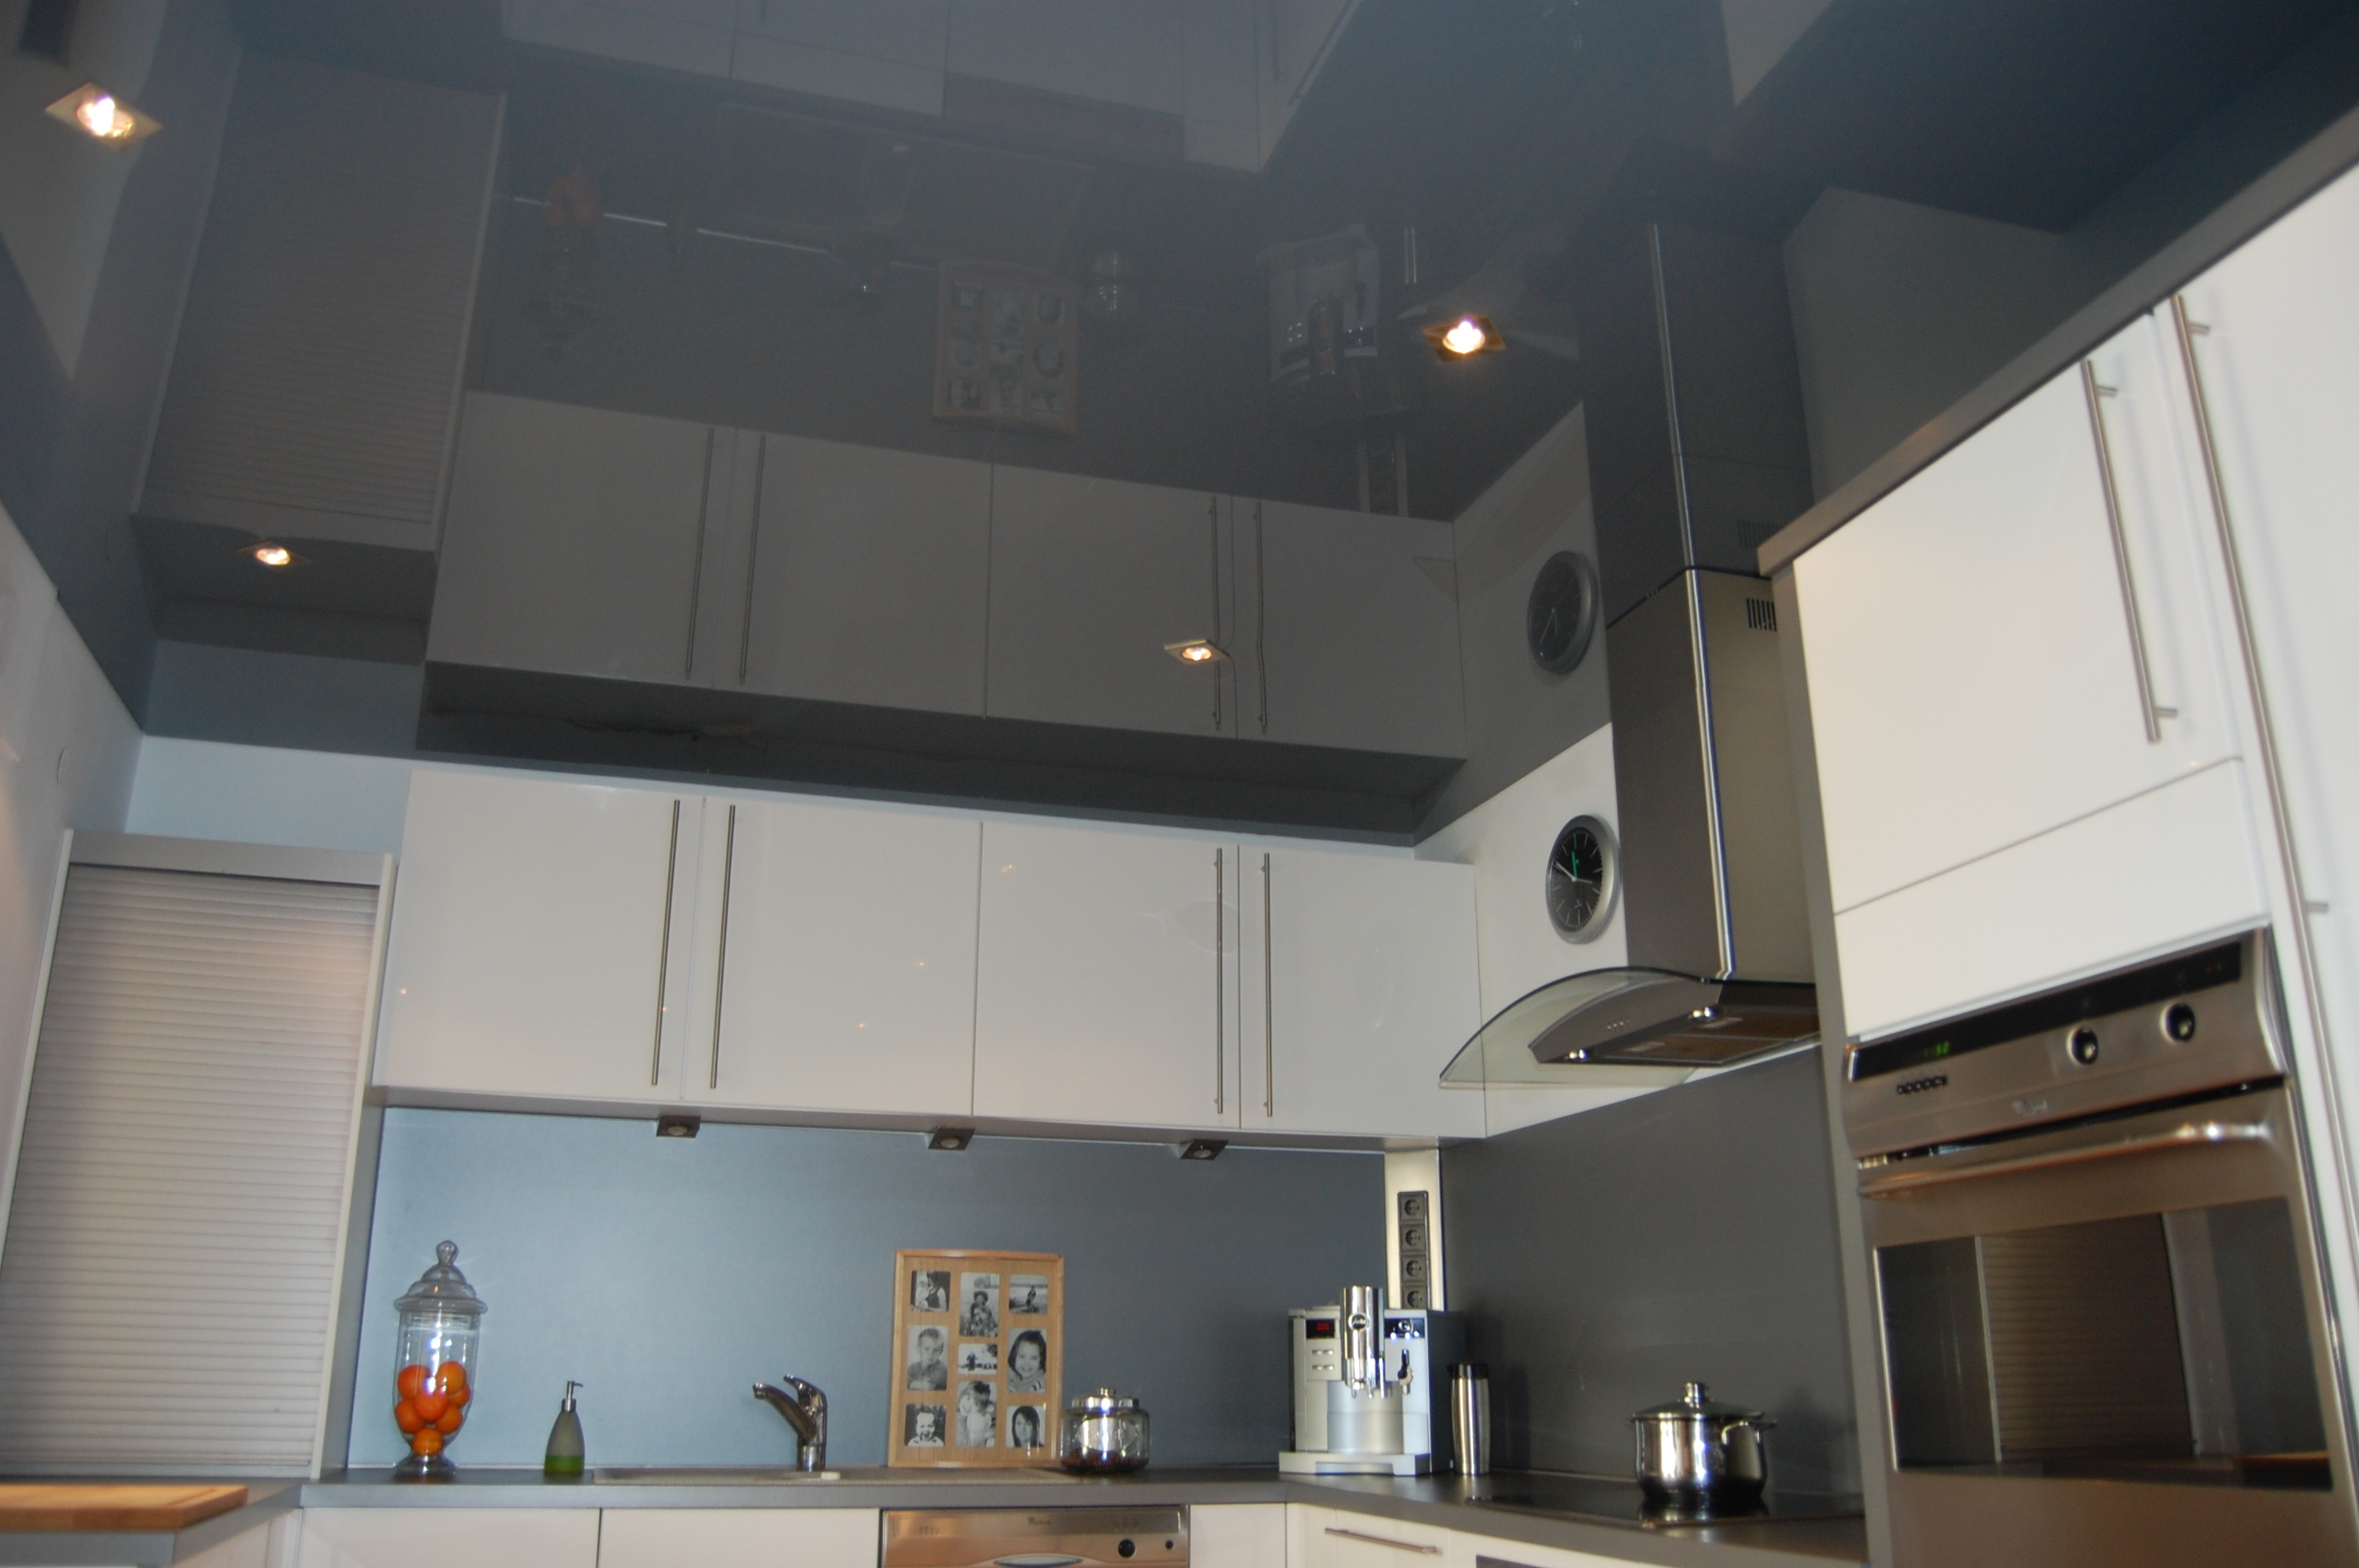 Spanndecken Preise M2 ~ Hausdesignhub.co